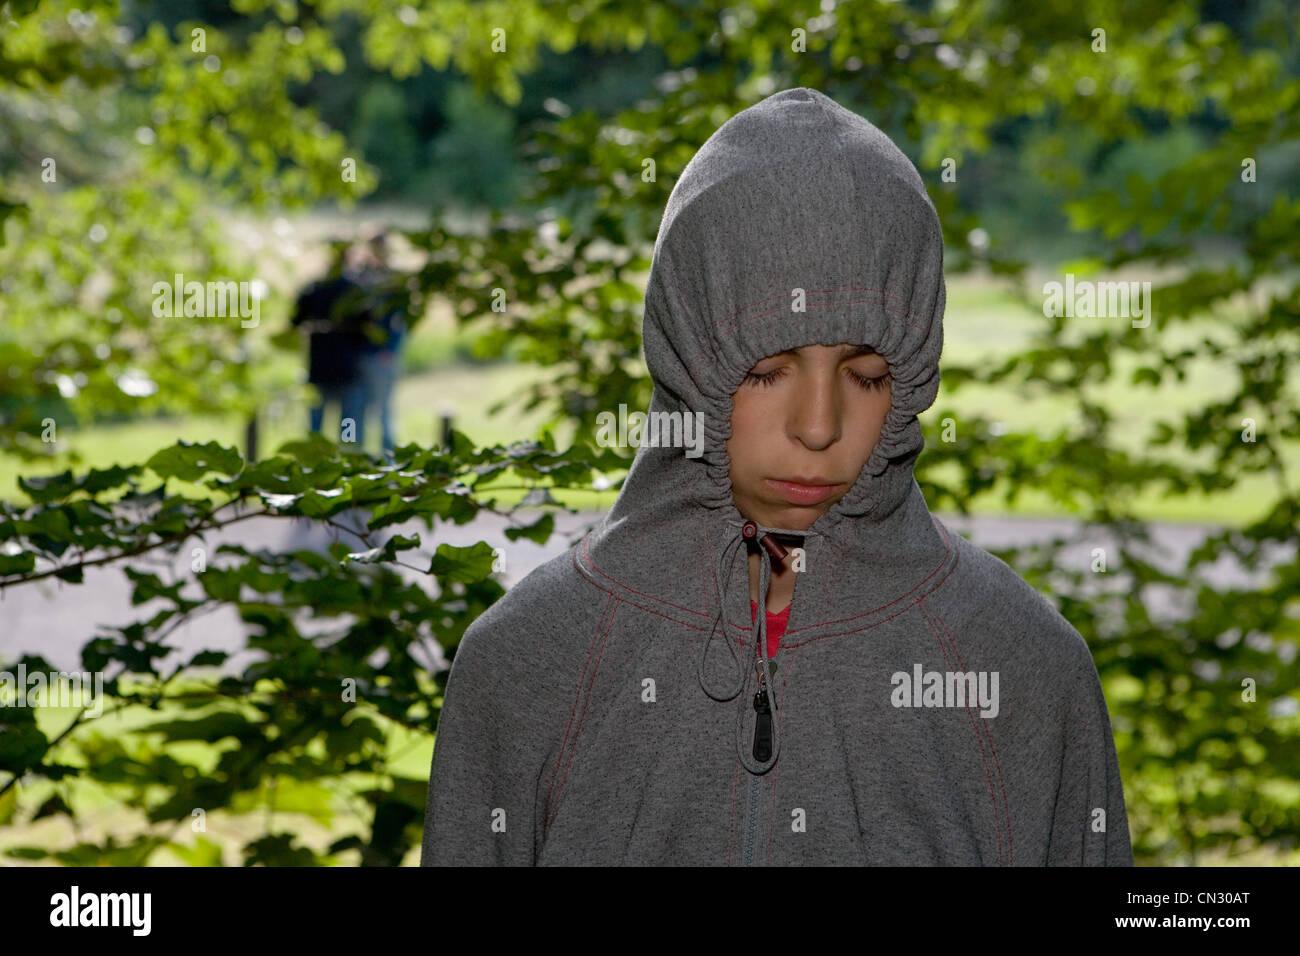 Teenage girl wearing grey hooded top - Stock Image